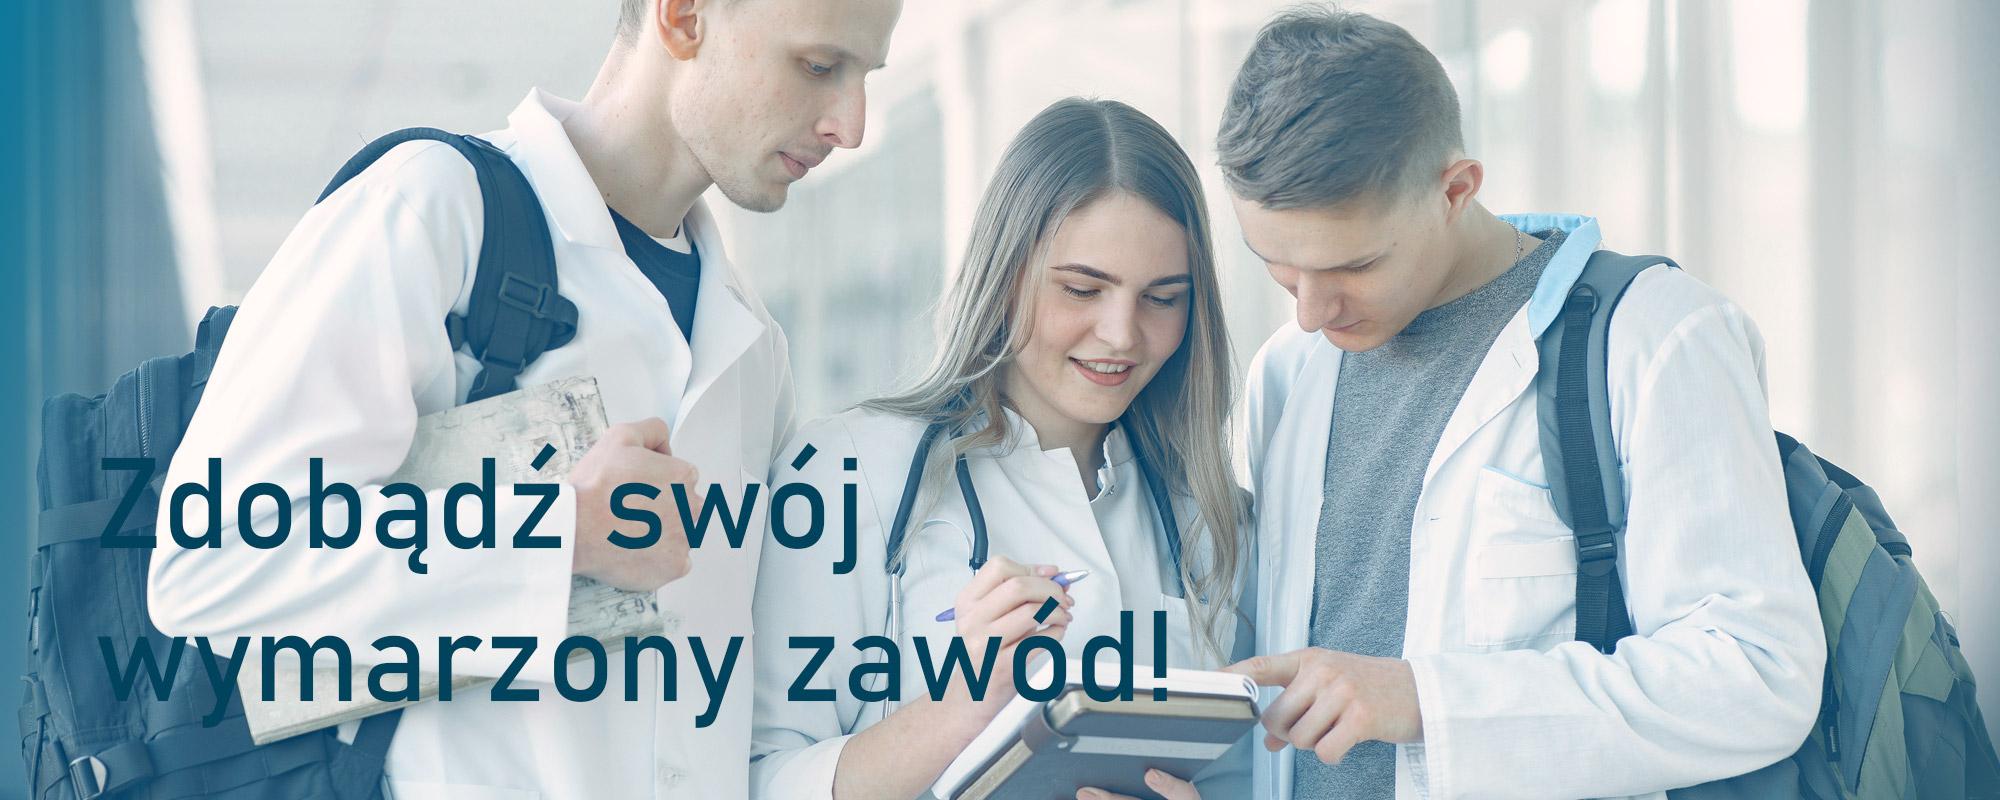 Studia lekarskie na Ukrainie